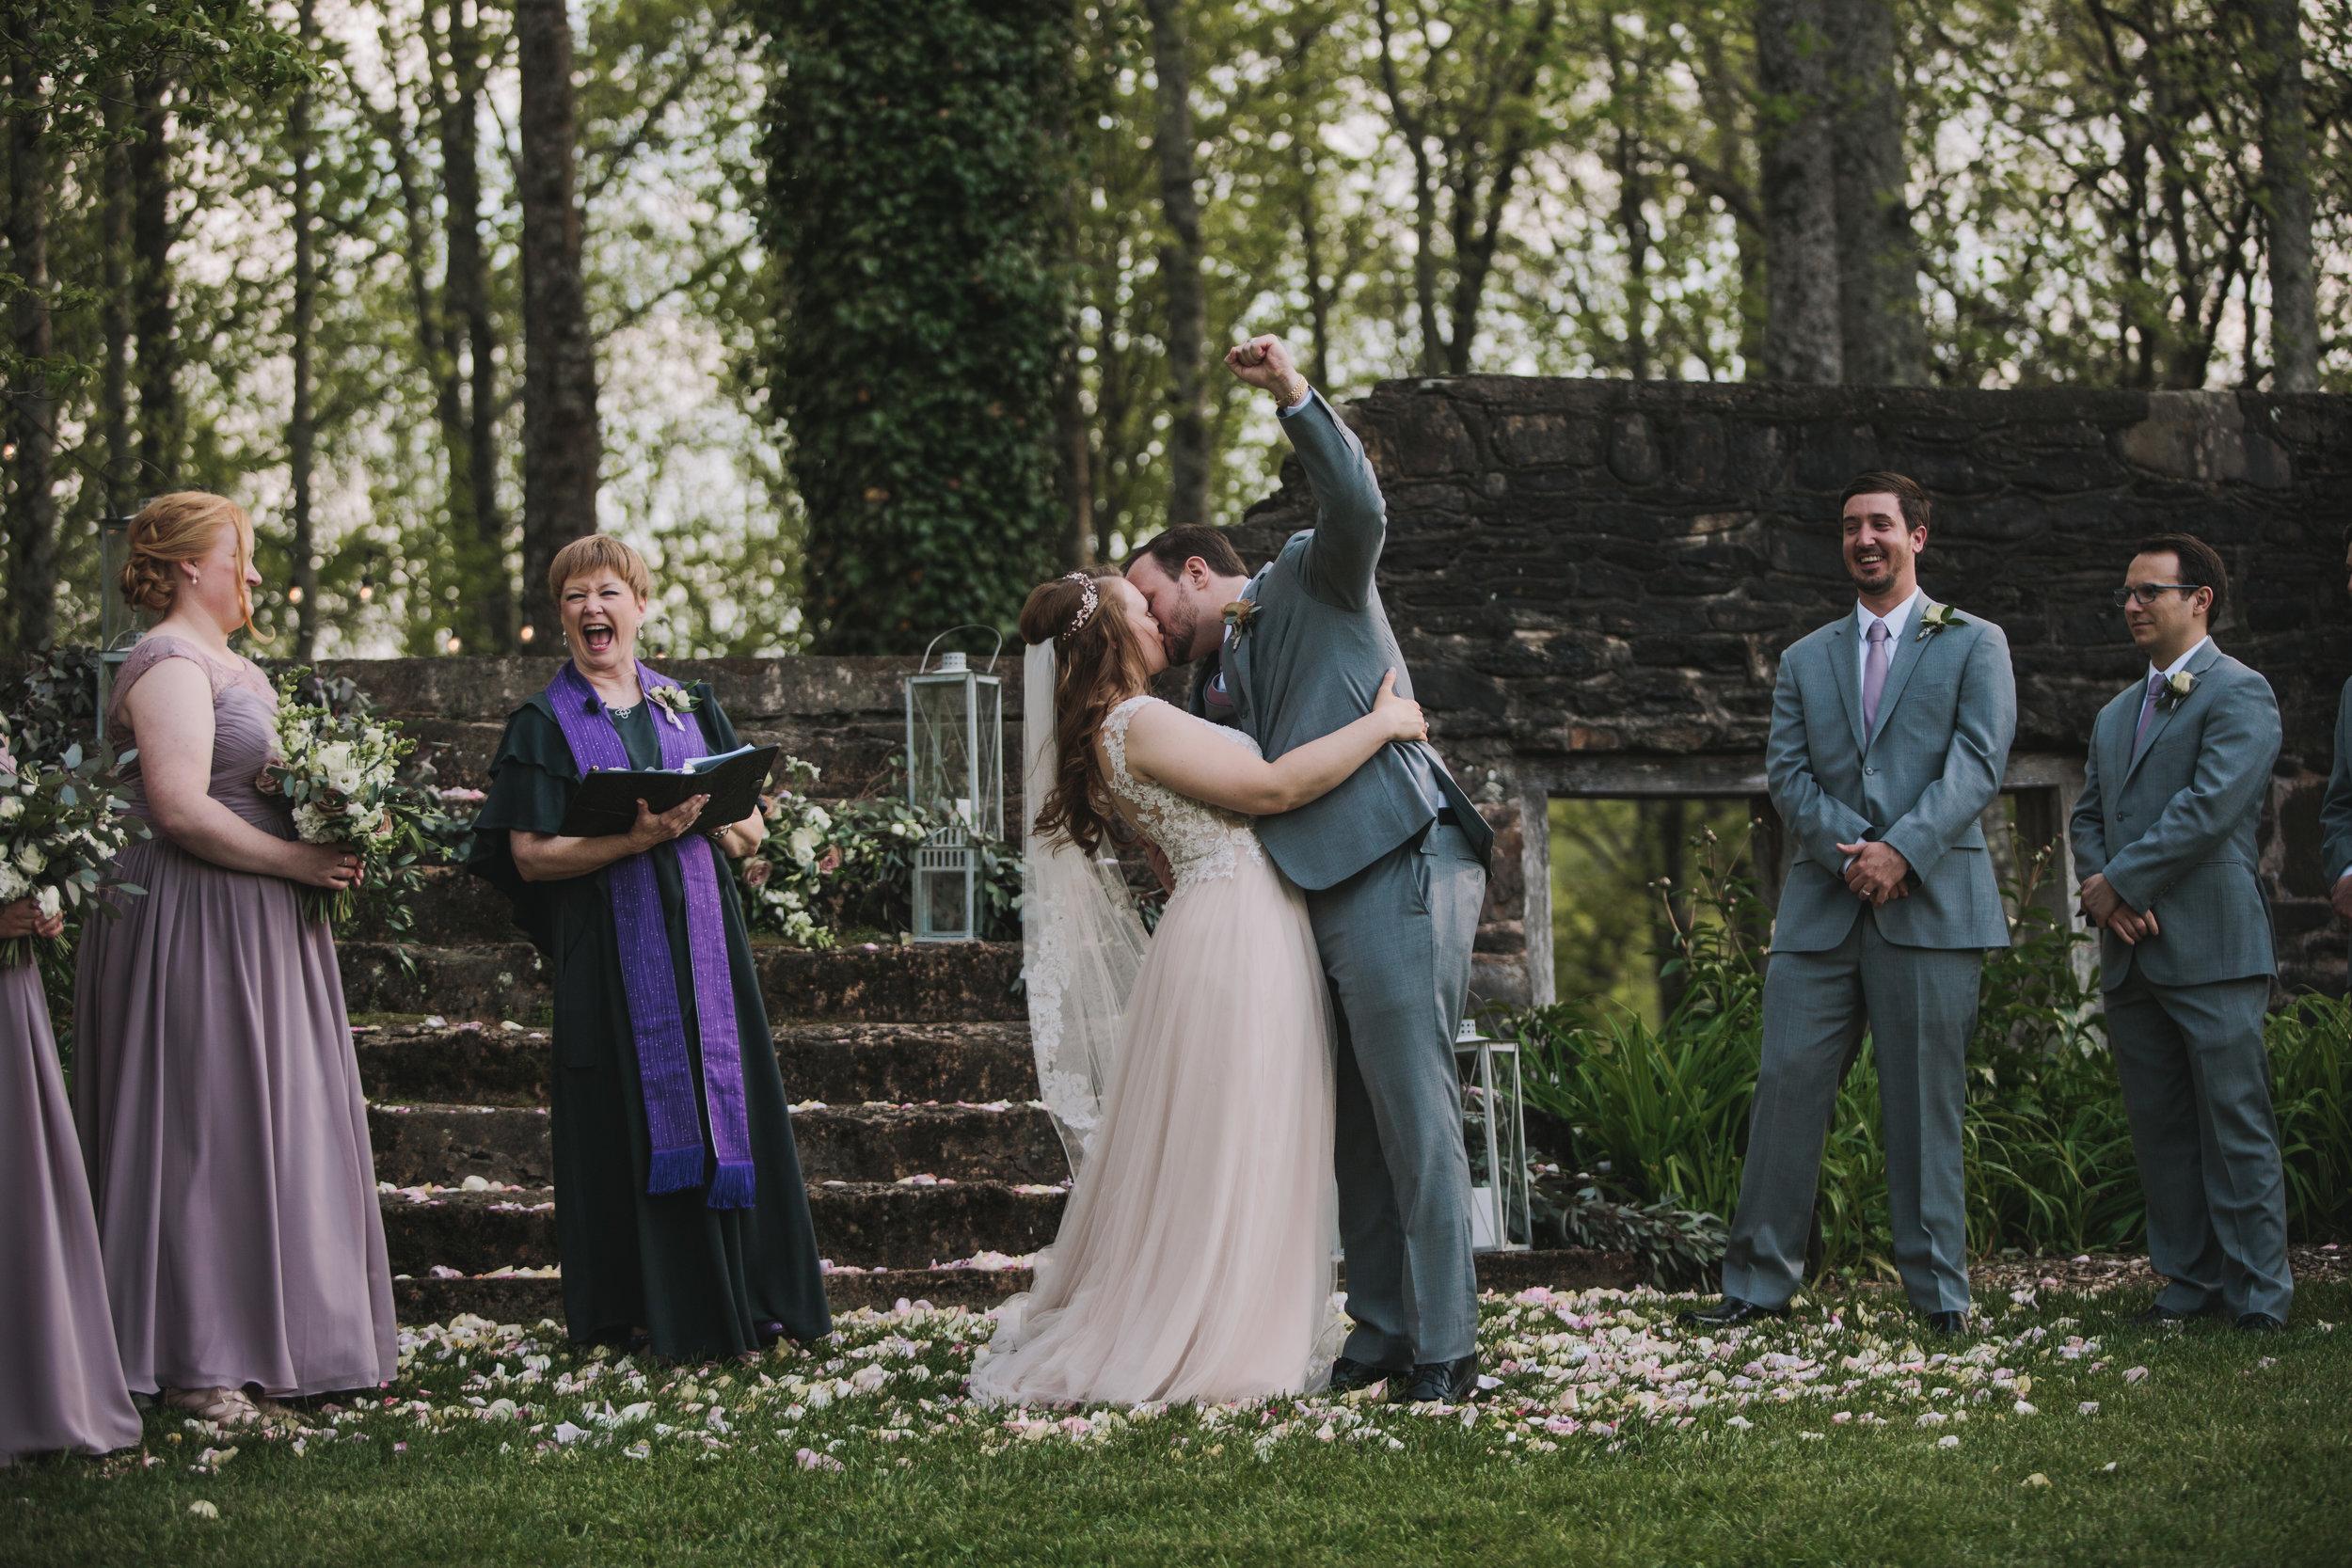 Lauryn+Andrew-Spring 2018-ceremony9.jpg